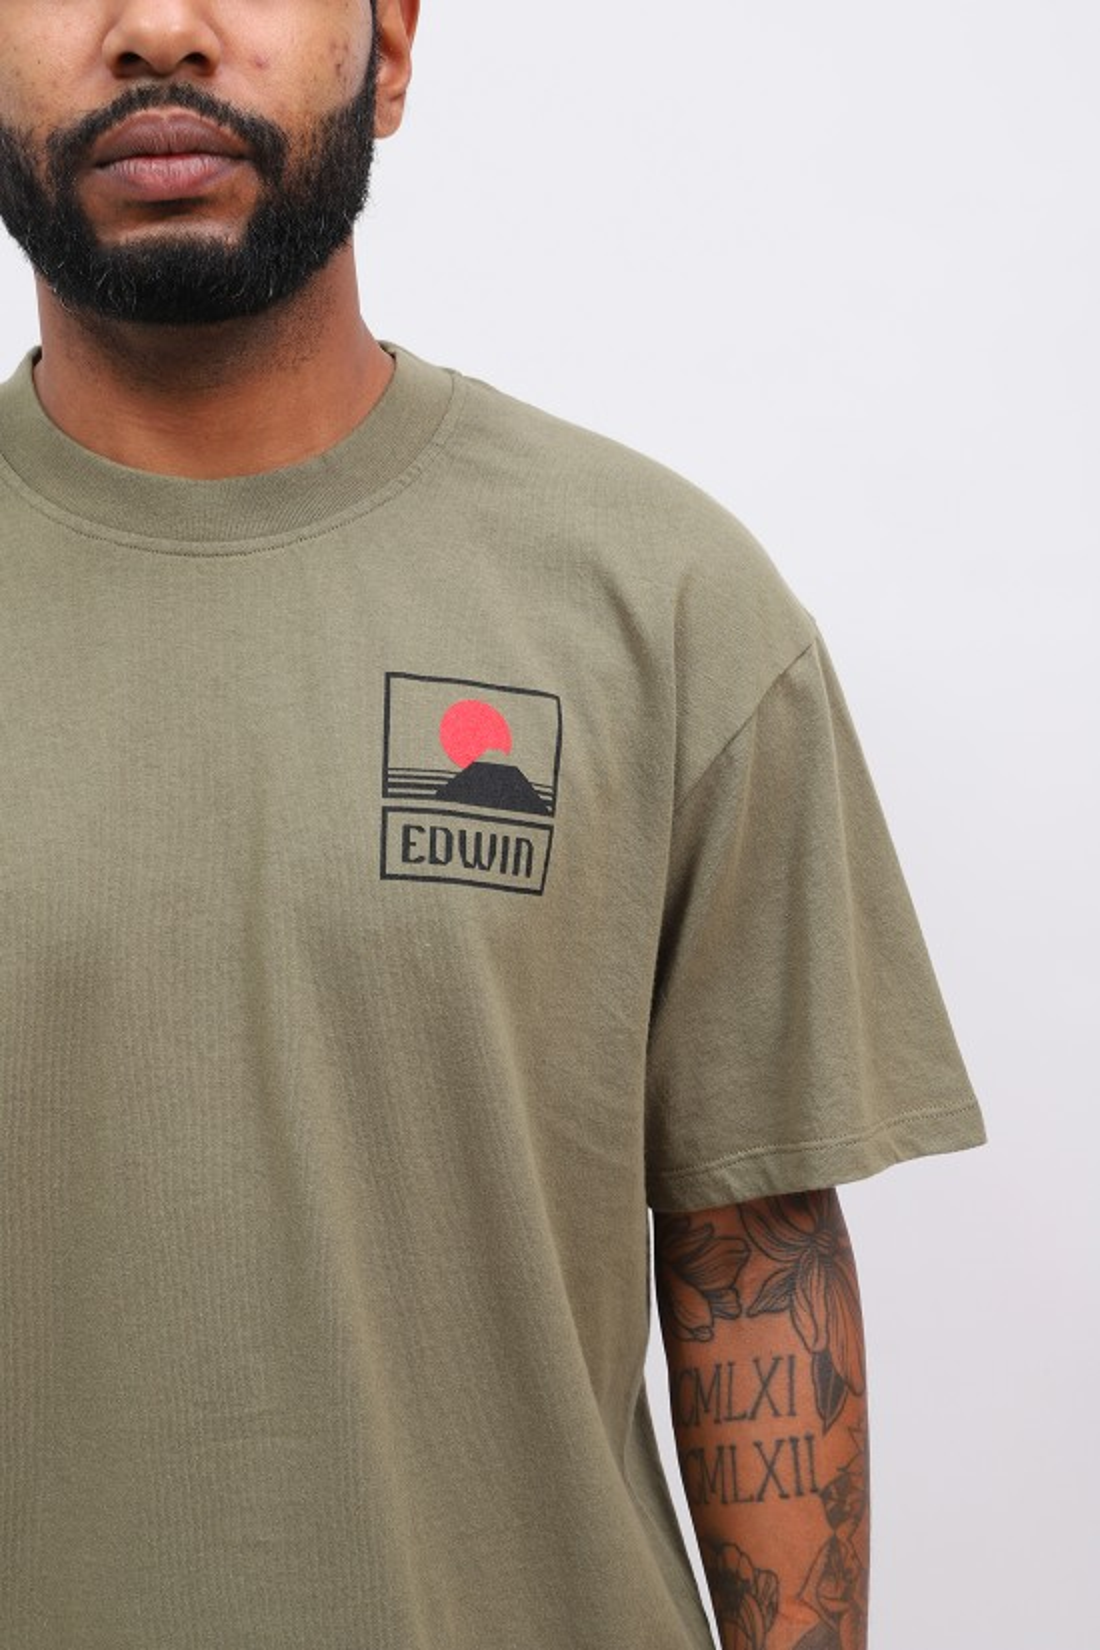 EDWIN / Sunset on mt fuji tee shirt Martini olive